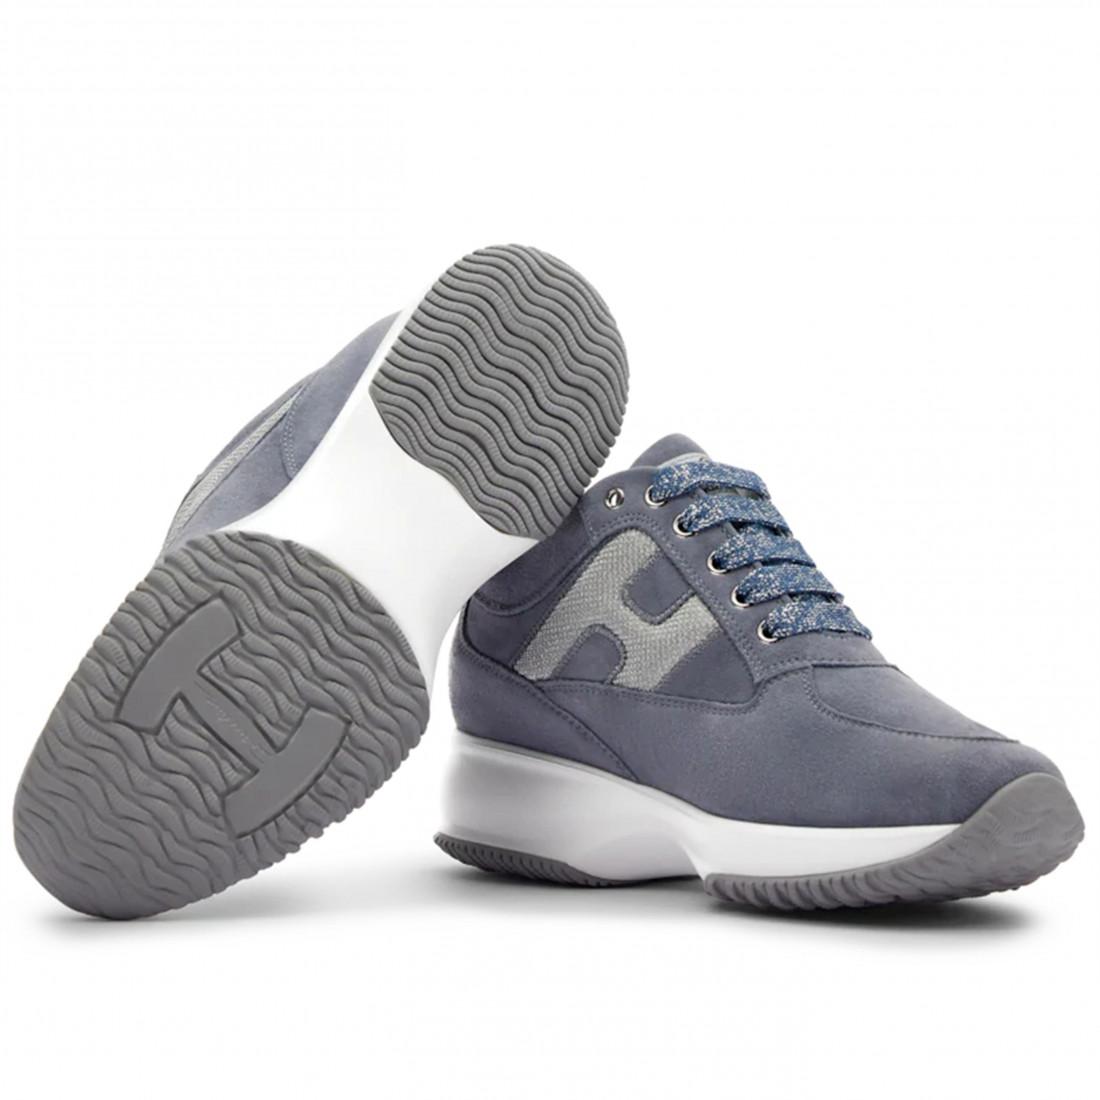 sneakers woman hogan hxw00n0s361p9c0rs1 8120